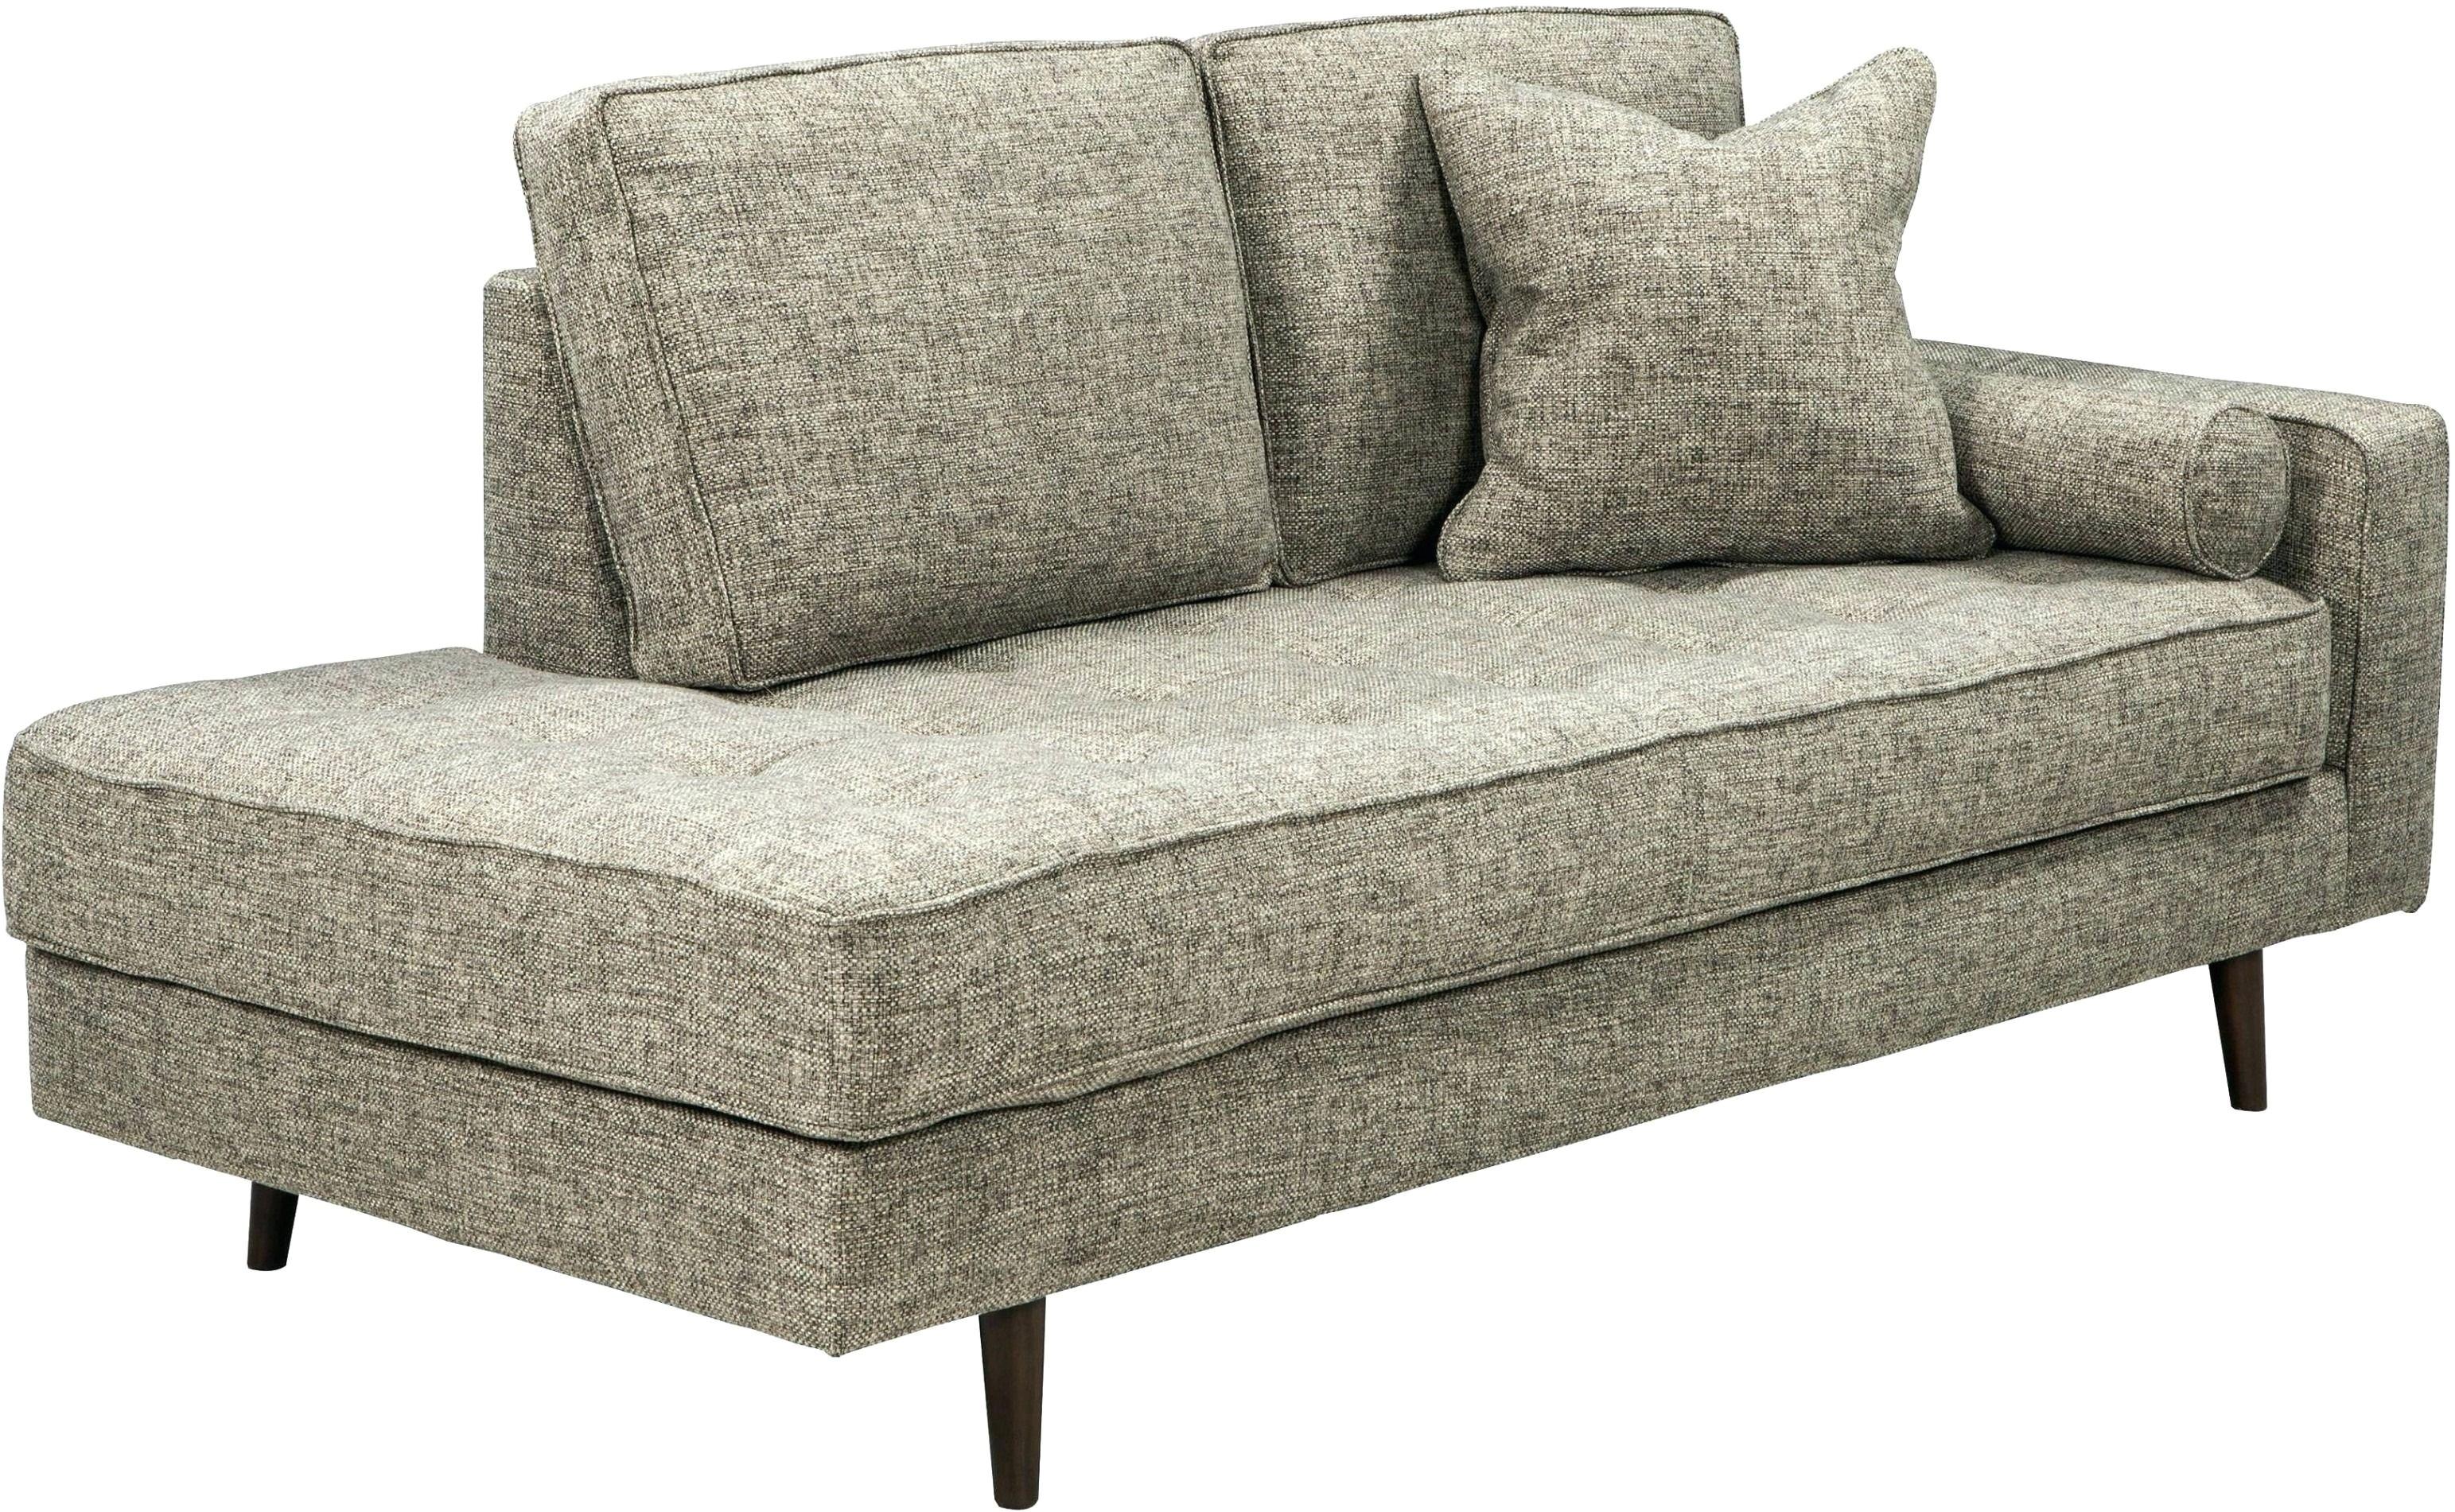 klappcouch ikea einzigartig 17 inspirierend mini sofa ikea galerie of klappcouch ikea frisch folding sleeper chair